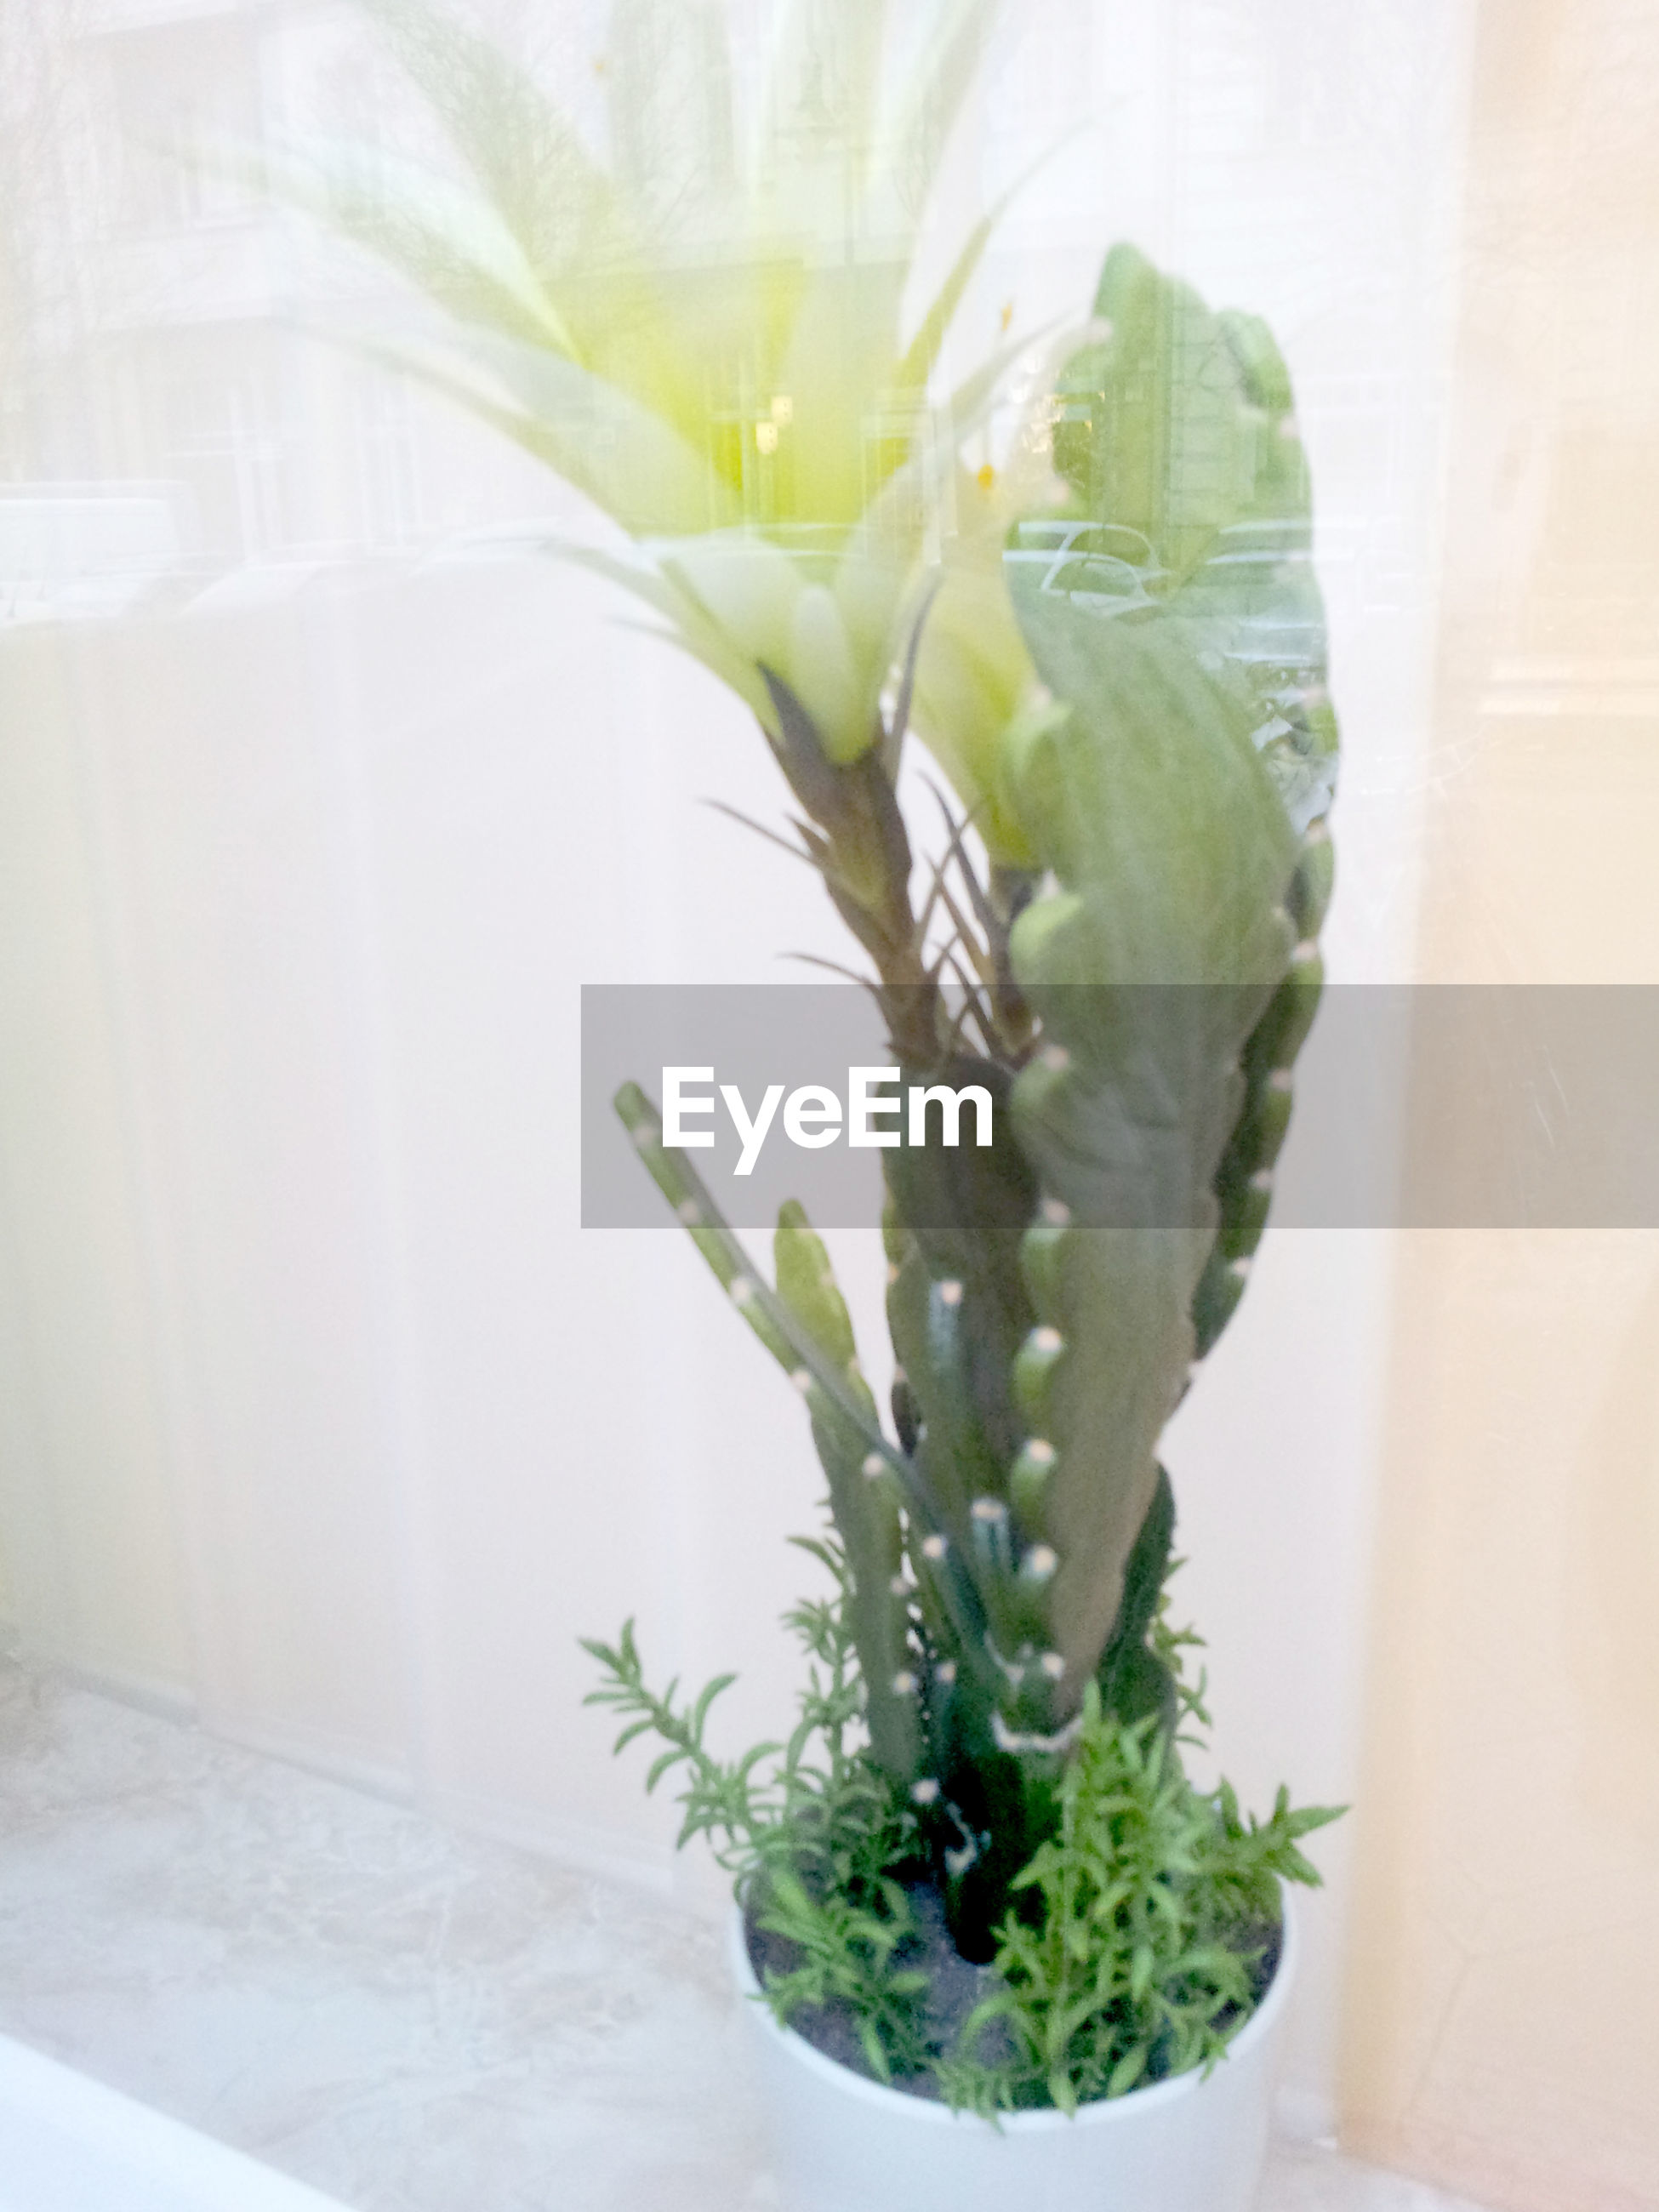 CLOSE-UP OF SUCCULENT PLANT IN SUNLIGHT